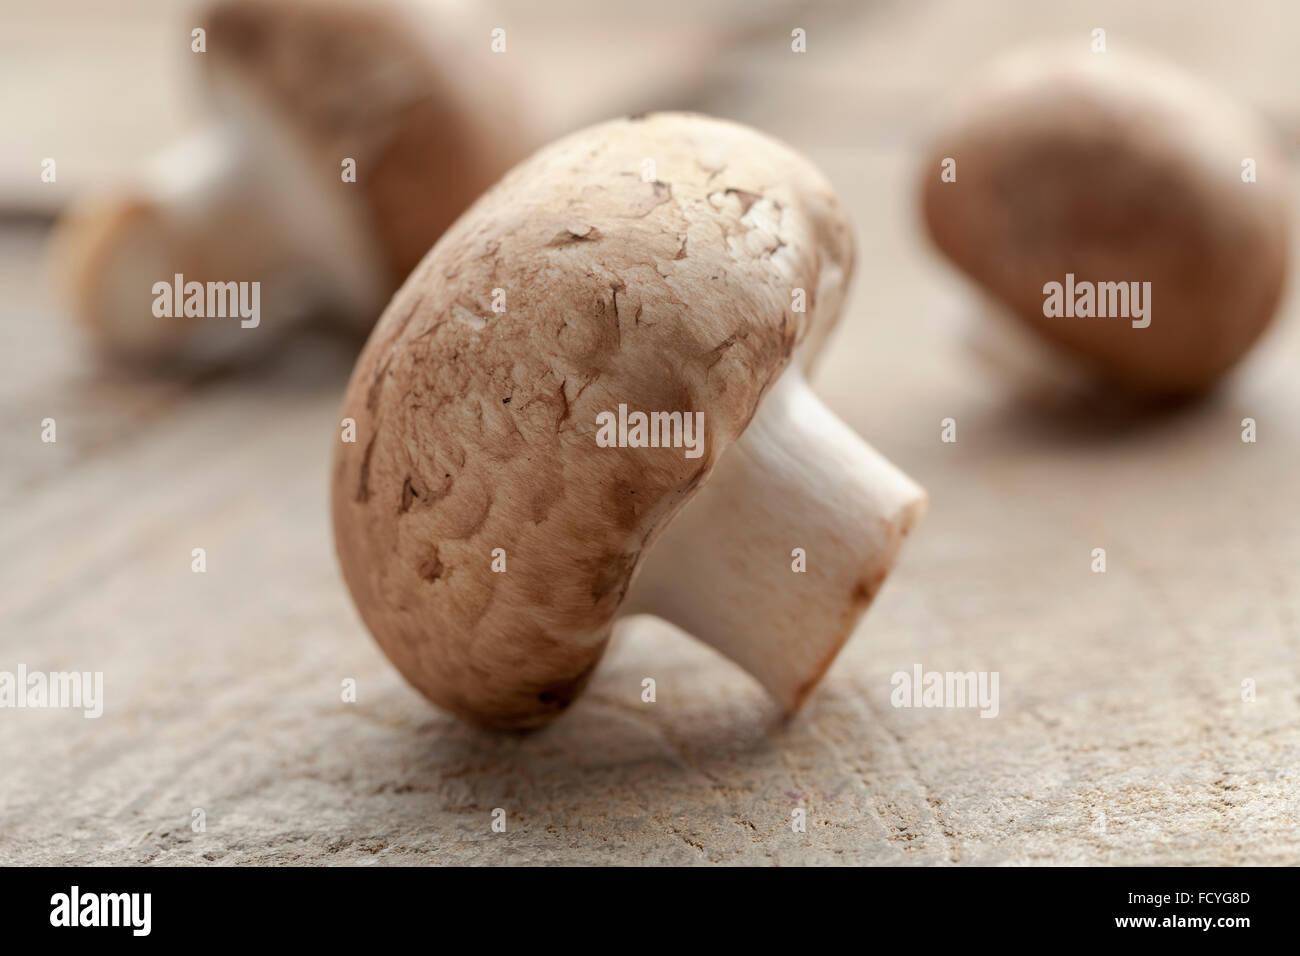 Fresh chestnut mushroom close up - Stock Image